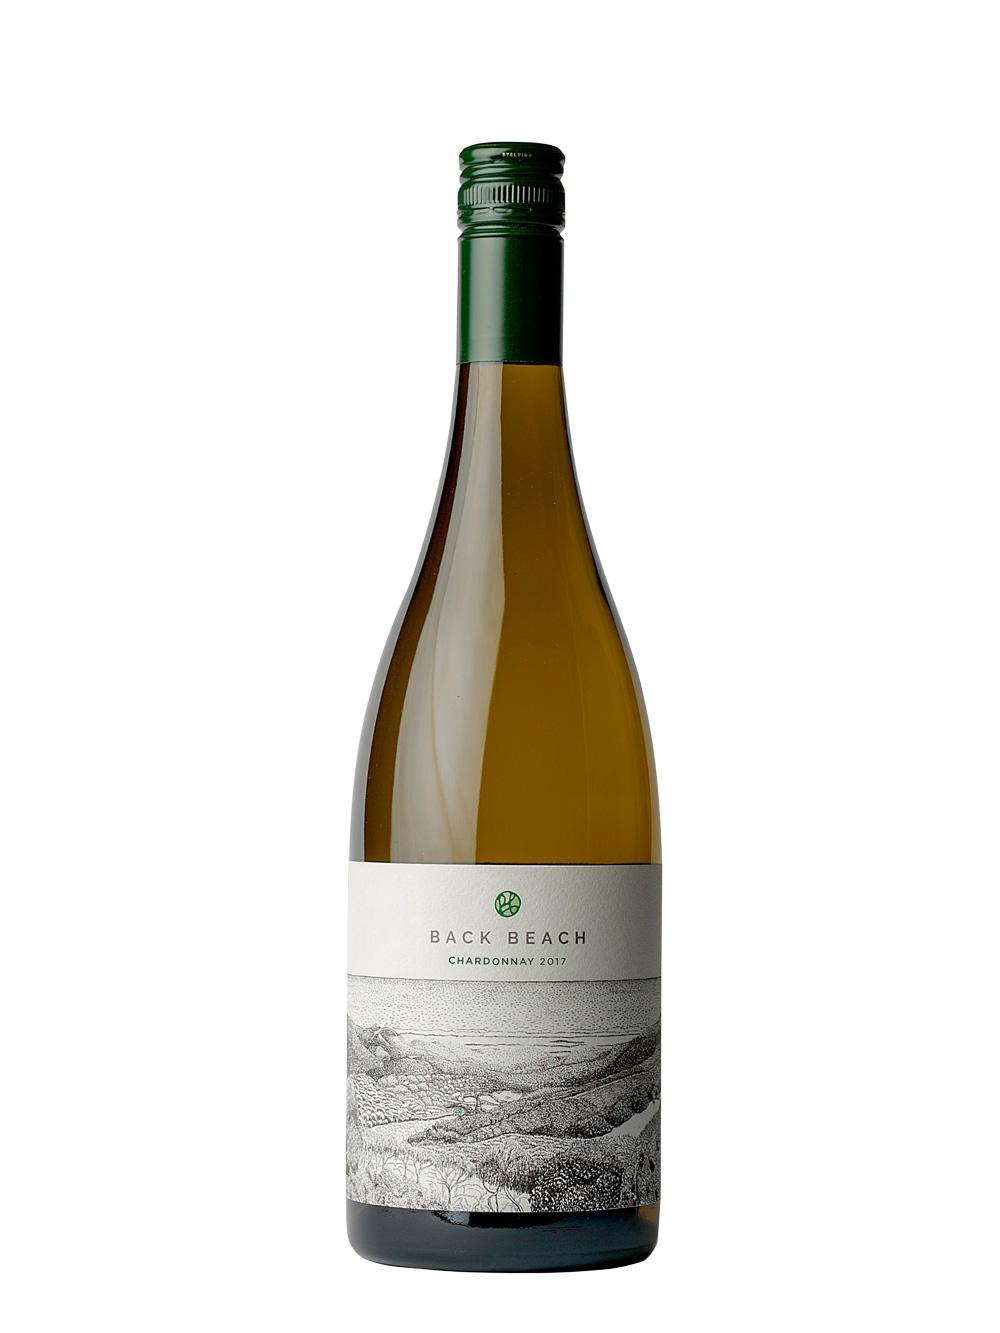 2017 Back Beach Chardonnay